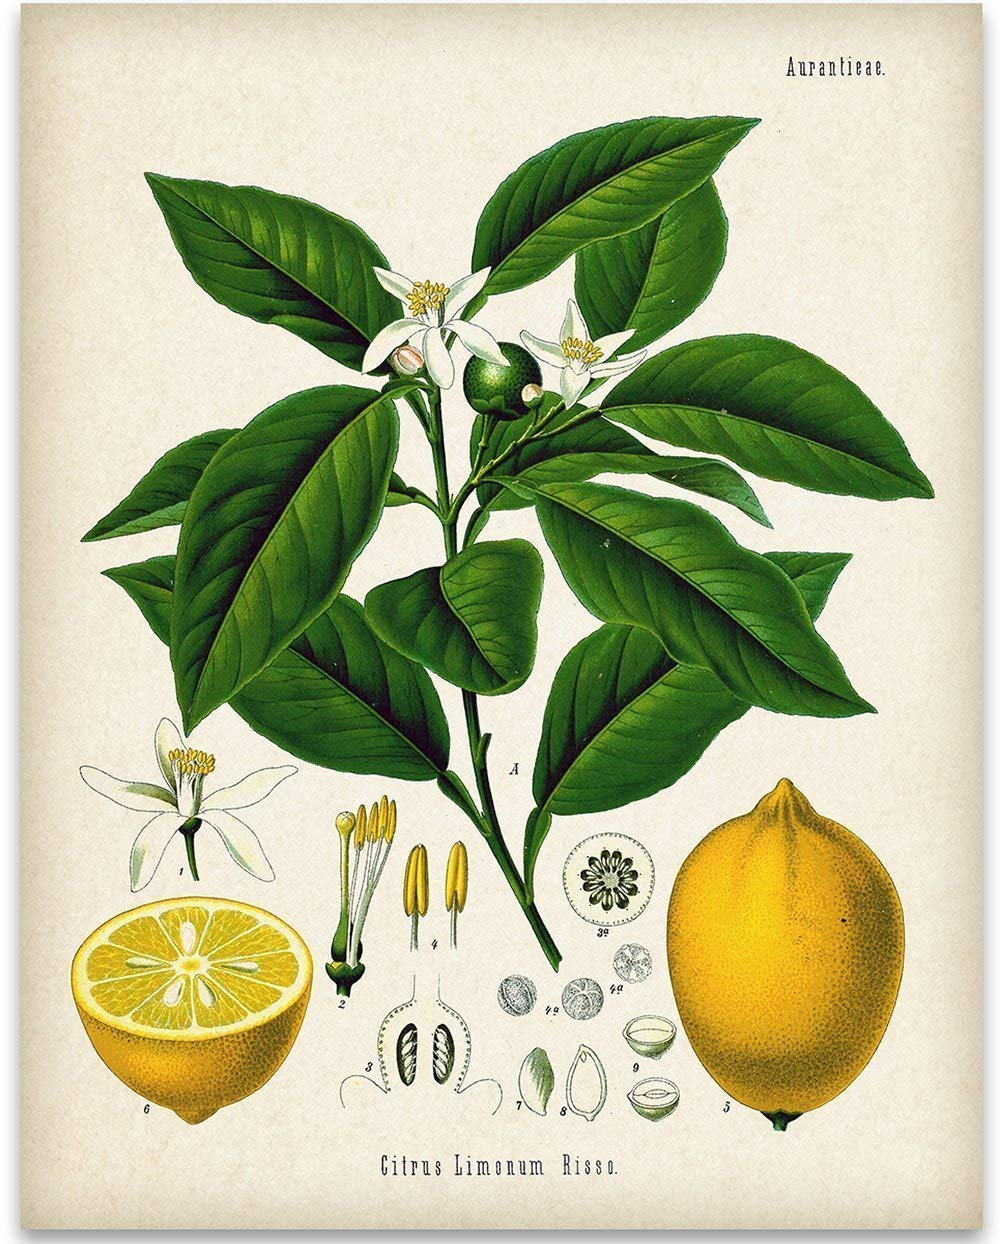 Lemon Citrus Botanical Illustration store - 11x14 Art Unframed Print Directly managed store